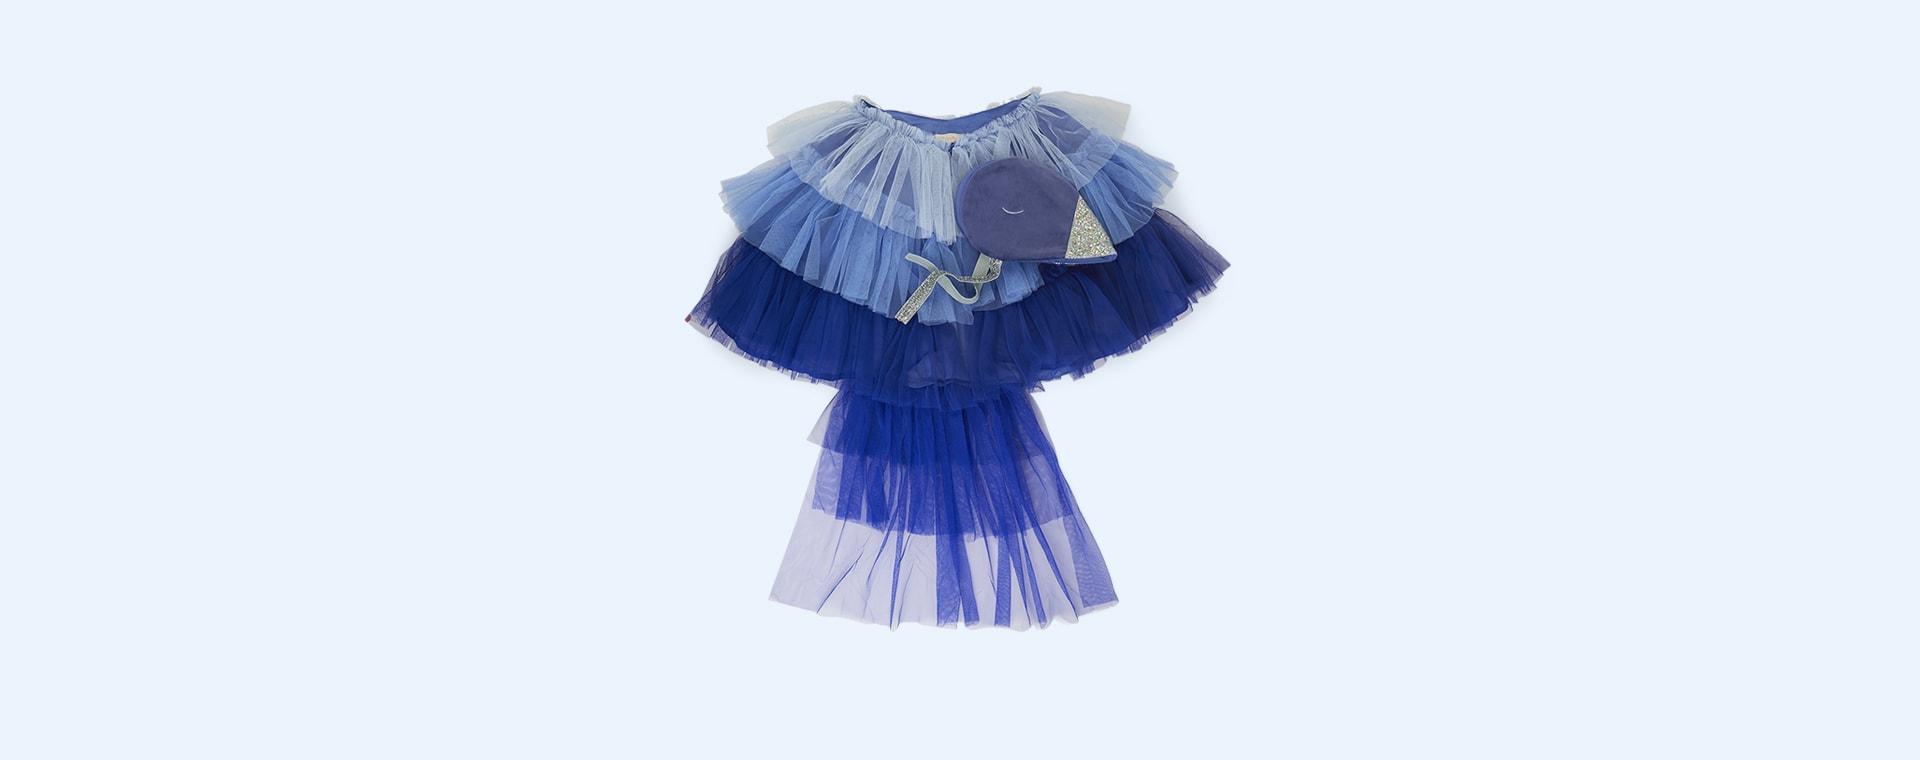 Blue Meri Meri Blue Bird Cape Dress Up